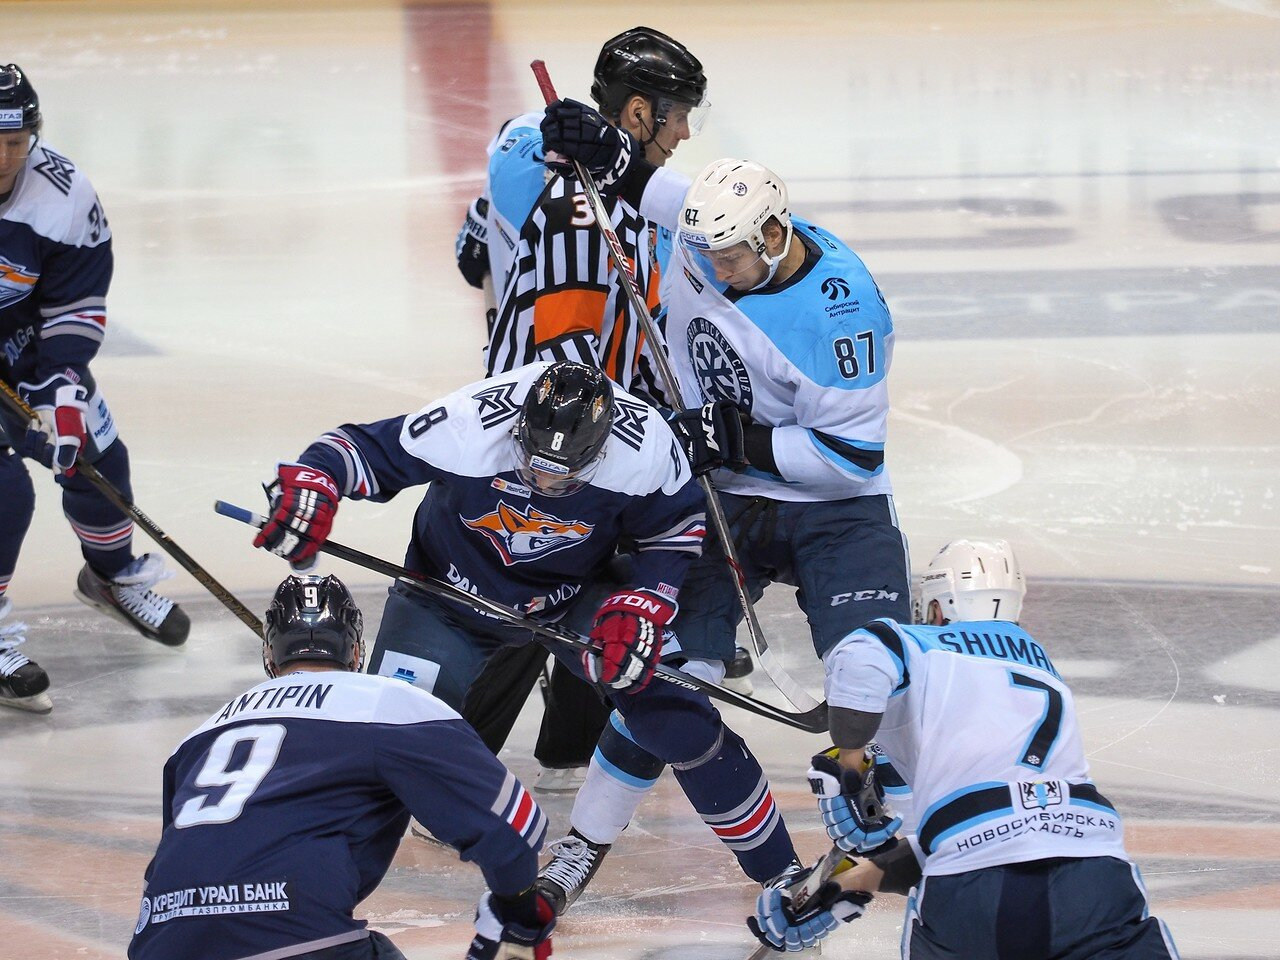 78Плей-офф 2016 Восток 1/2 Металлург - Сибирь 10.03.2016